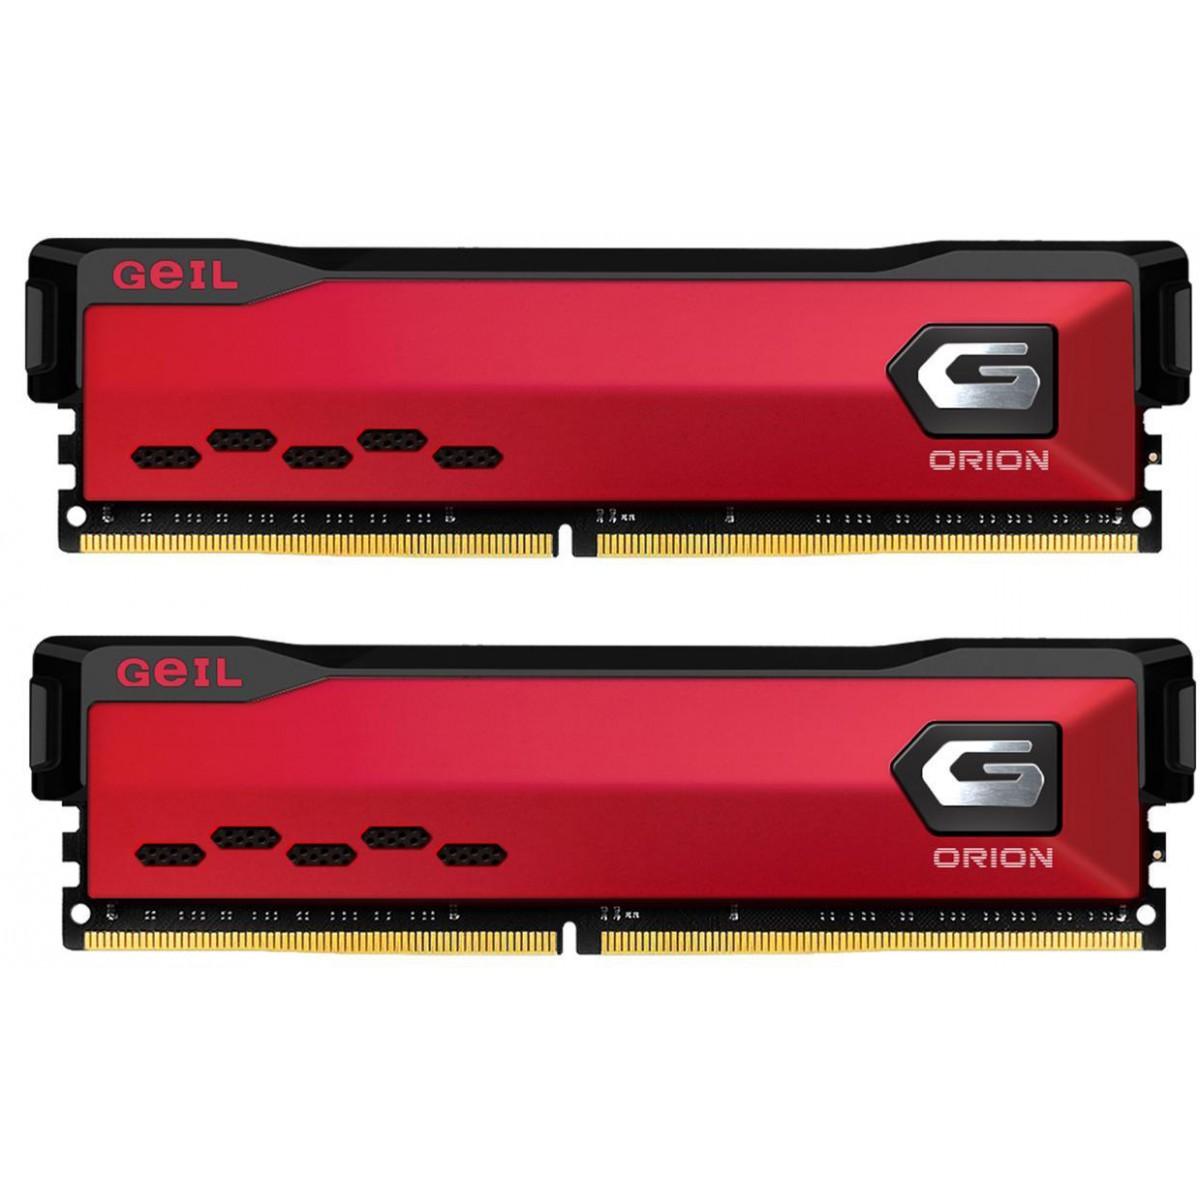 Memória DDR4 Geil Orion, 16GB (2x8GB) 3200MHz, Vermelho, GAOR416GB3200C16ADC